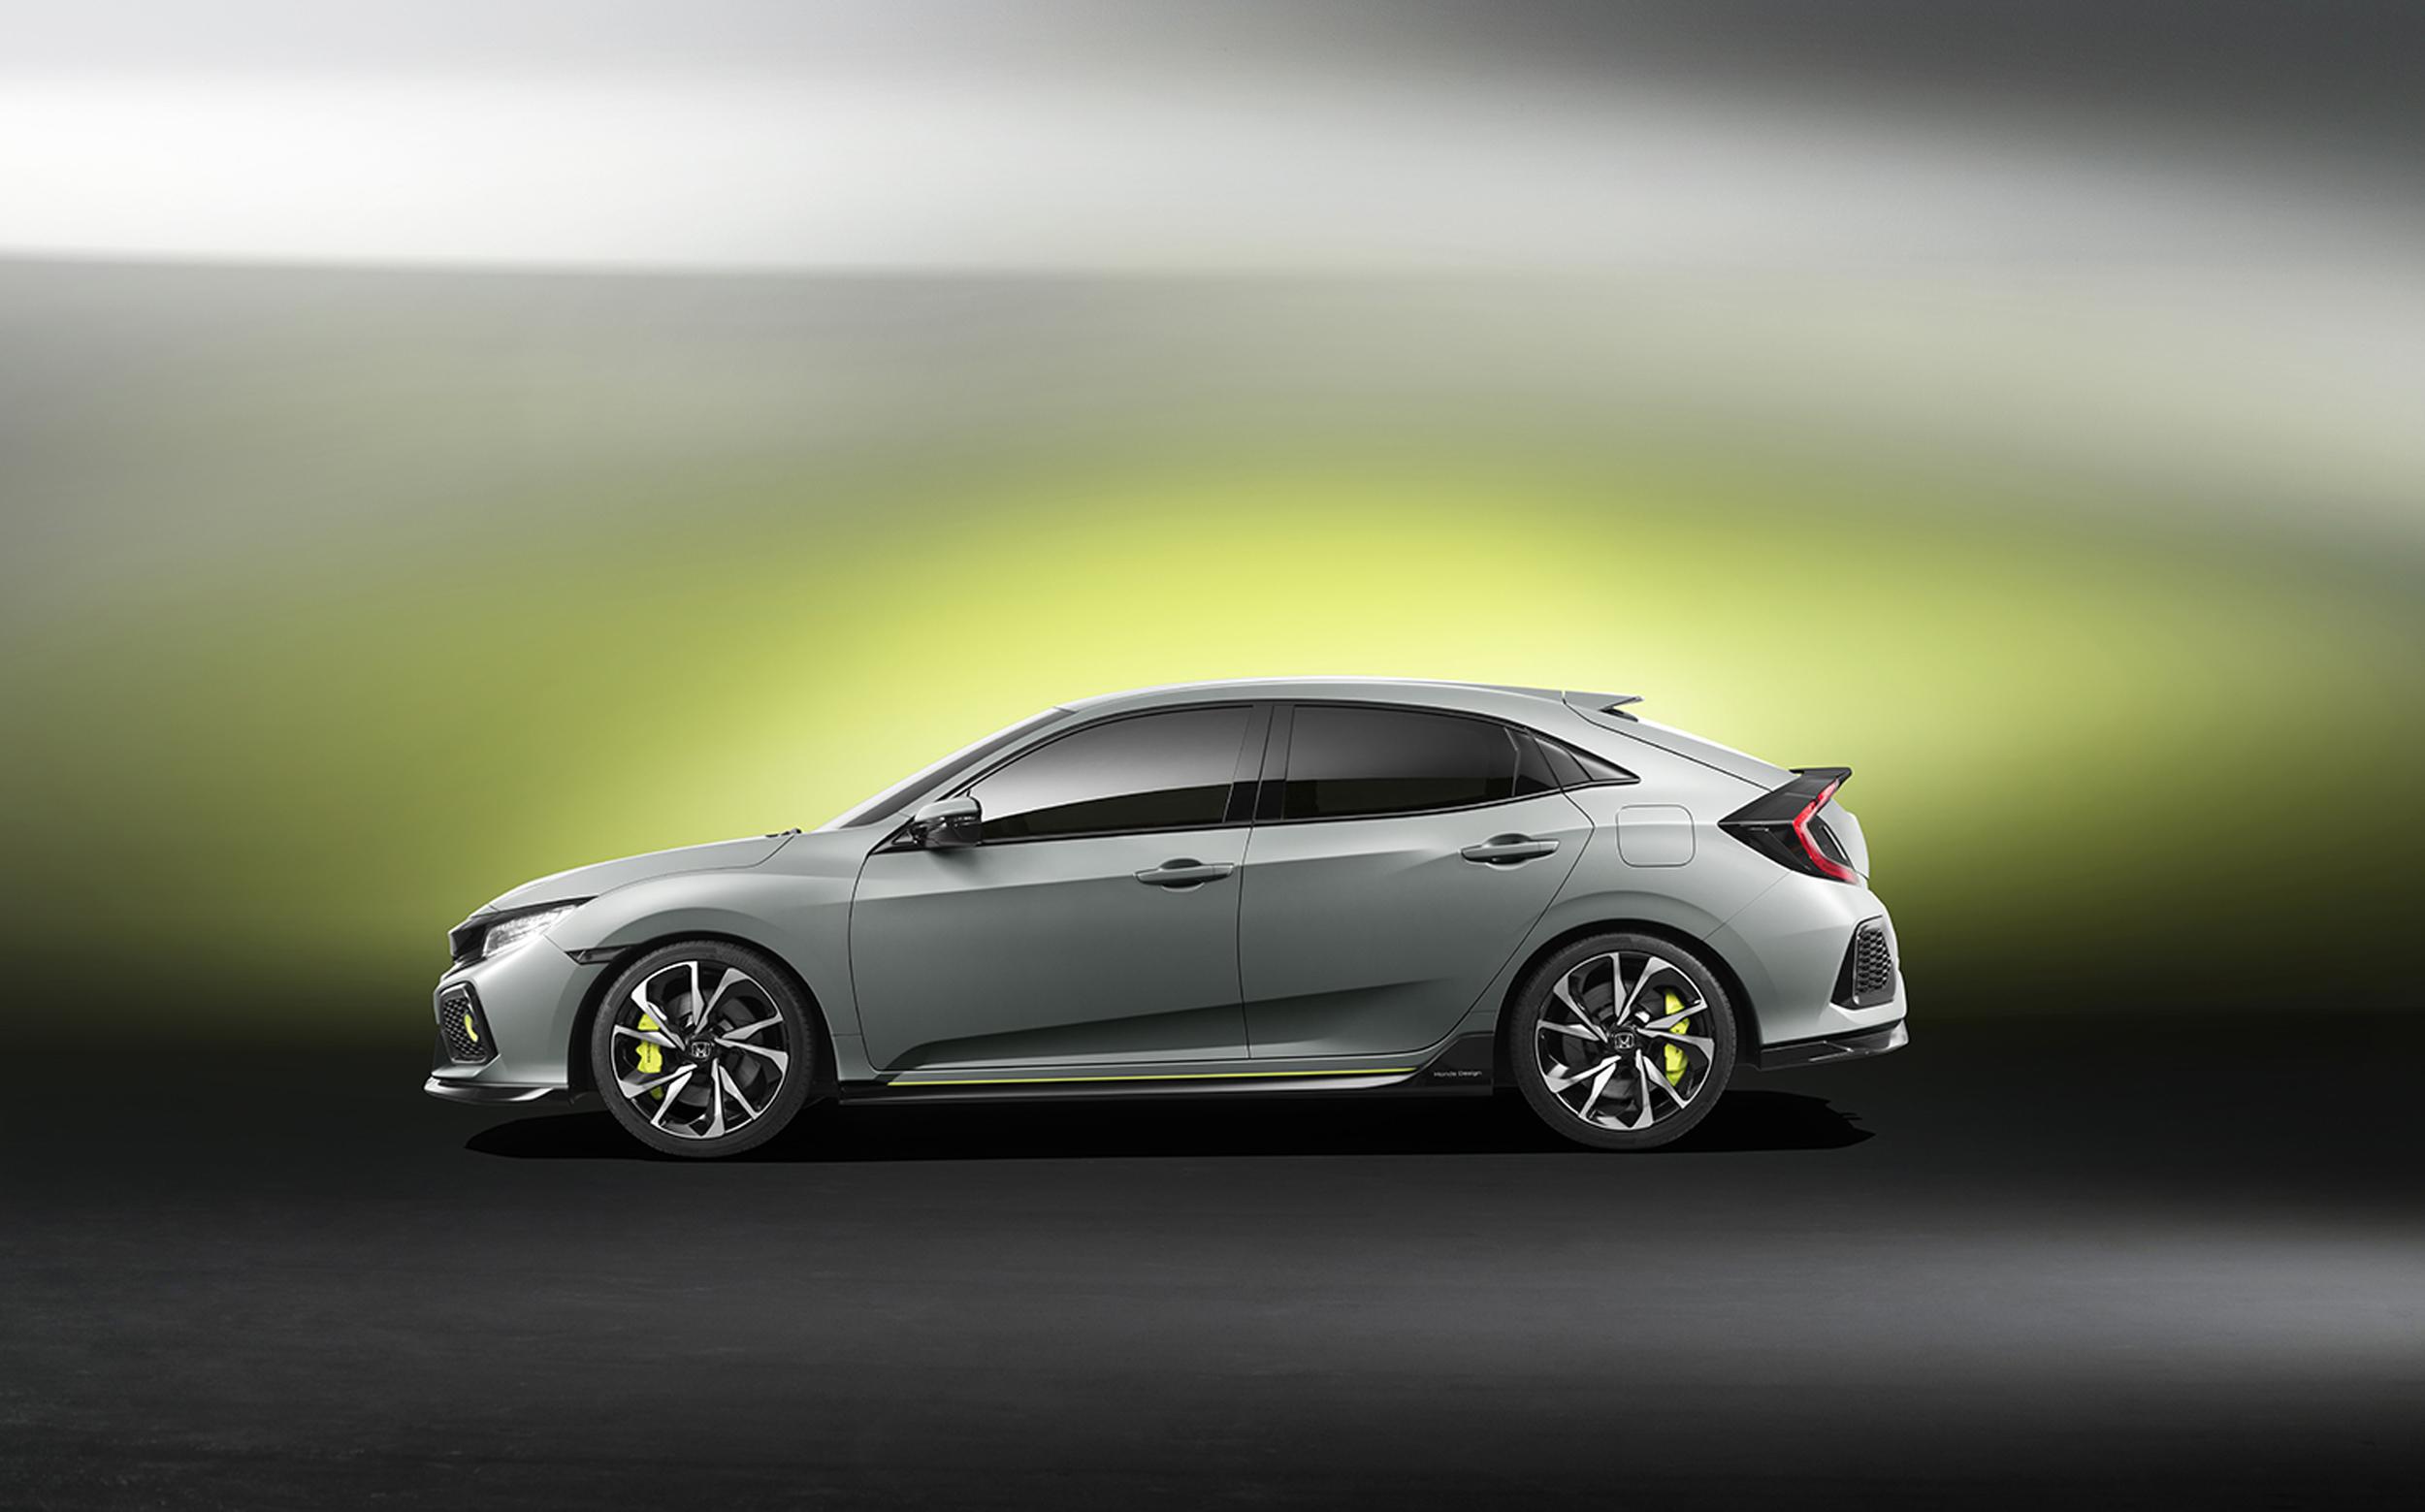 Honda Civic Hatchback Prototype Geneva Debut